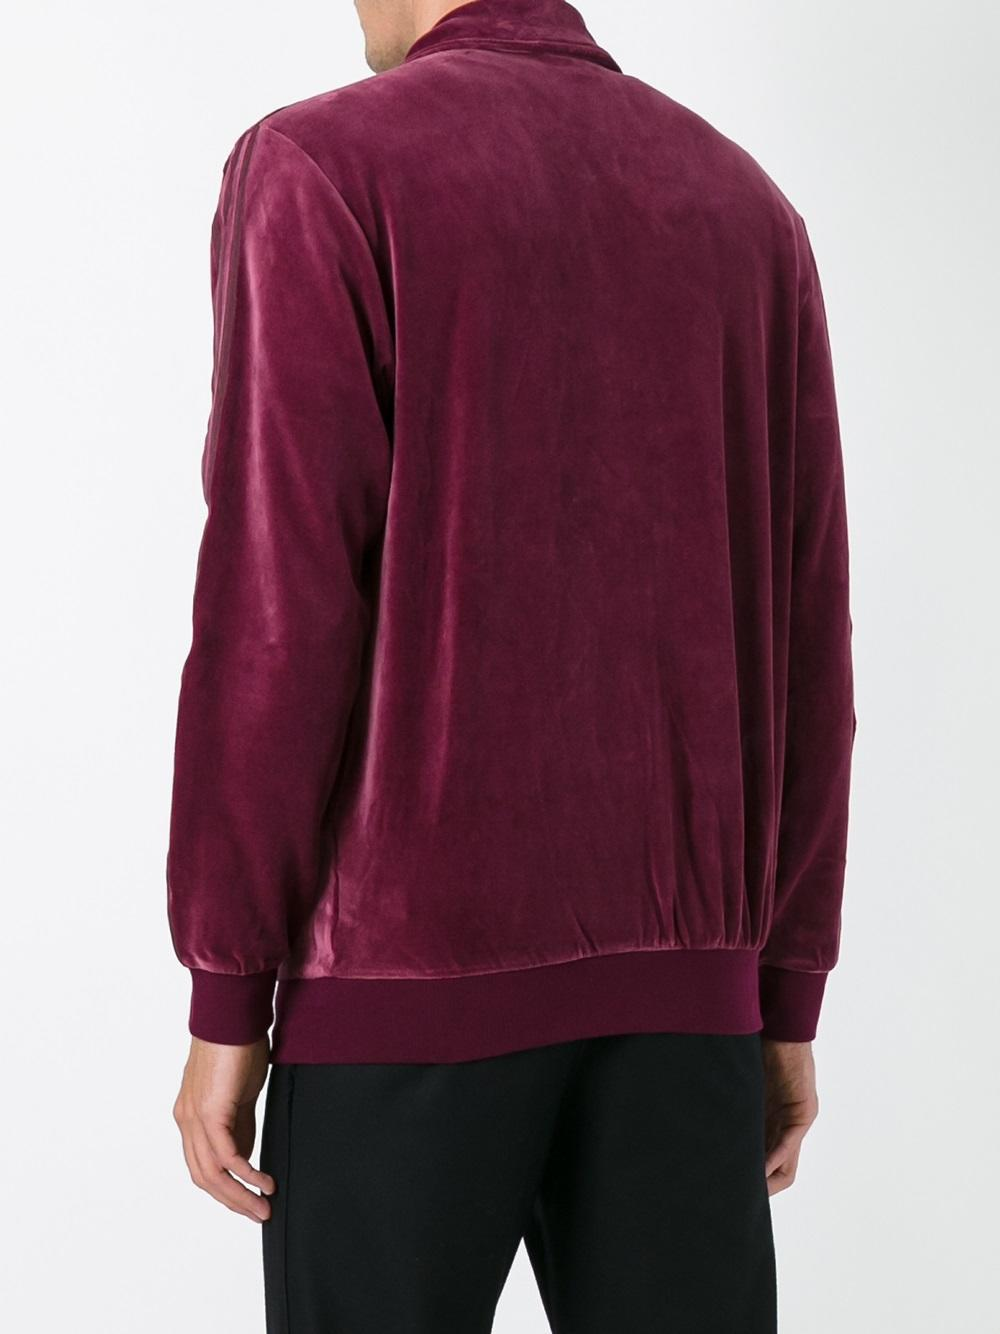 adidas originals 39 beckenbauer 39 velour track jacket in red. Black Bedroom Furniture Sets. Home Design Ideas